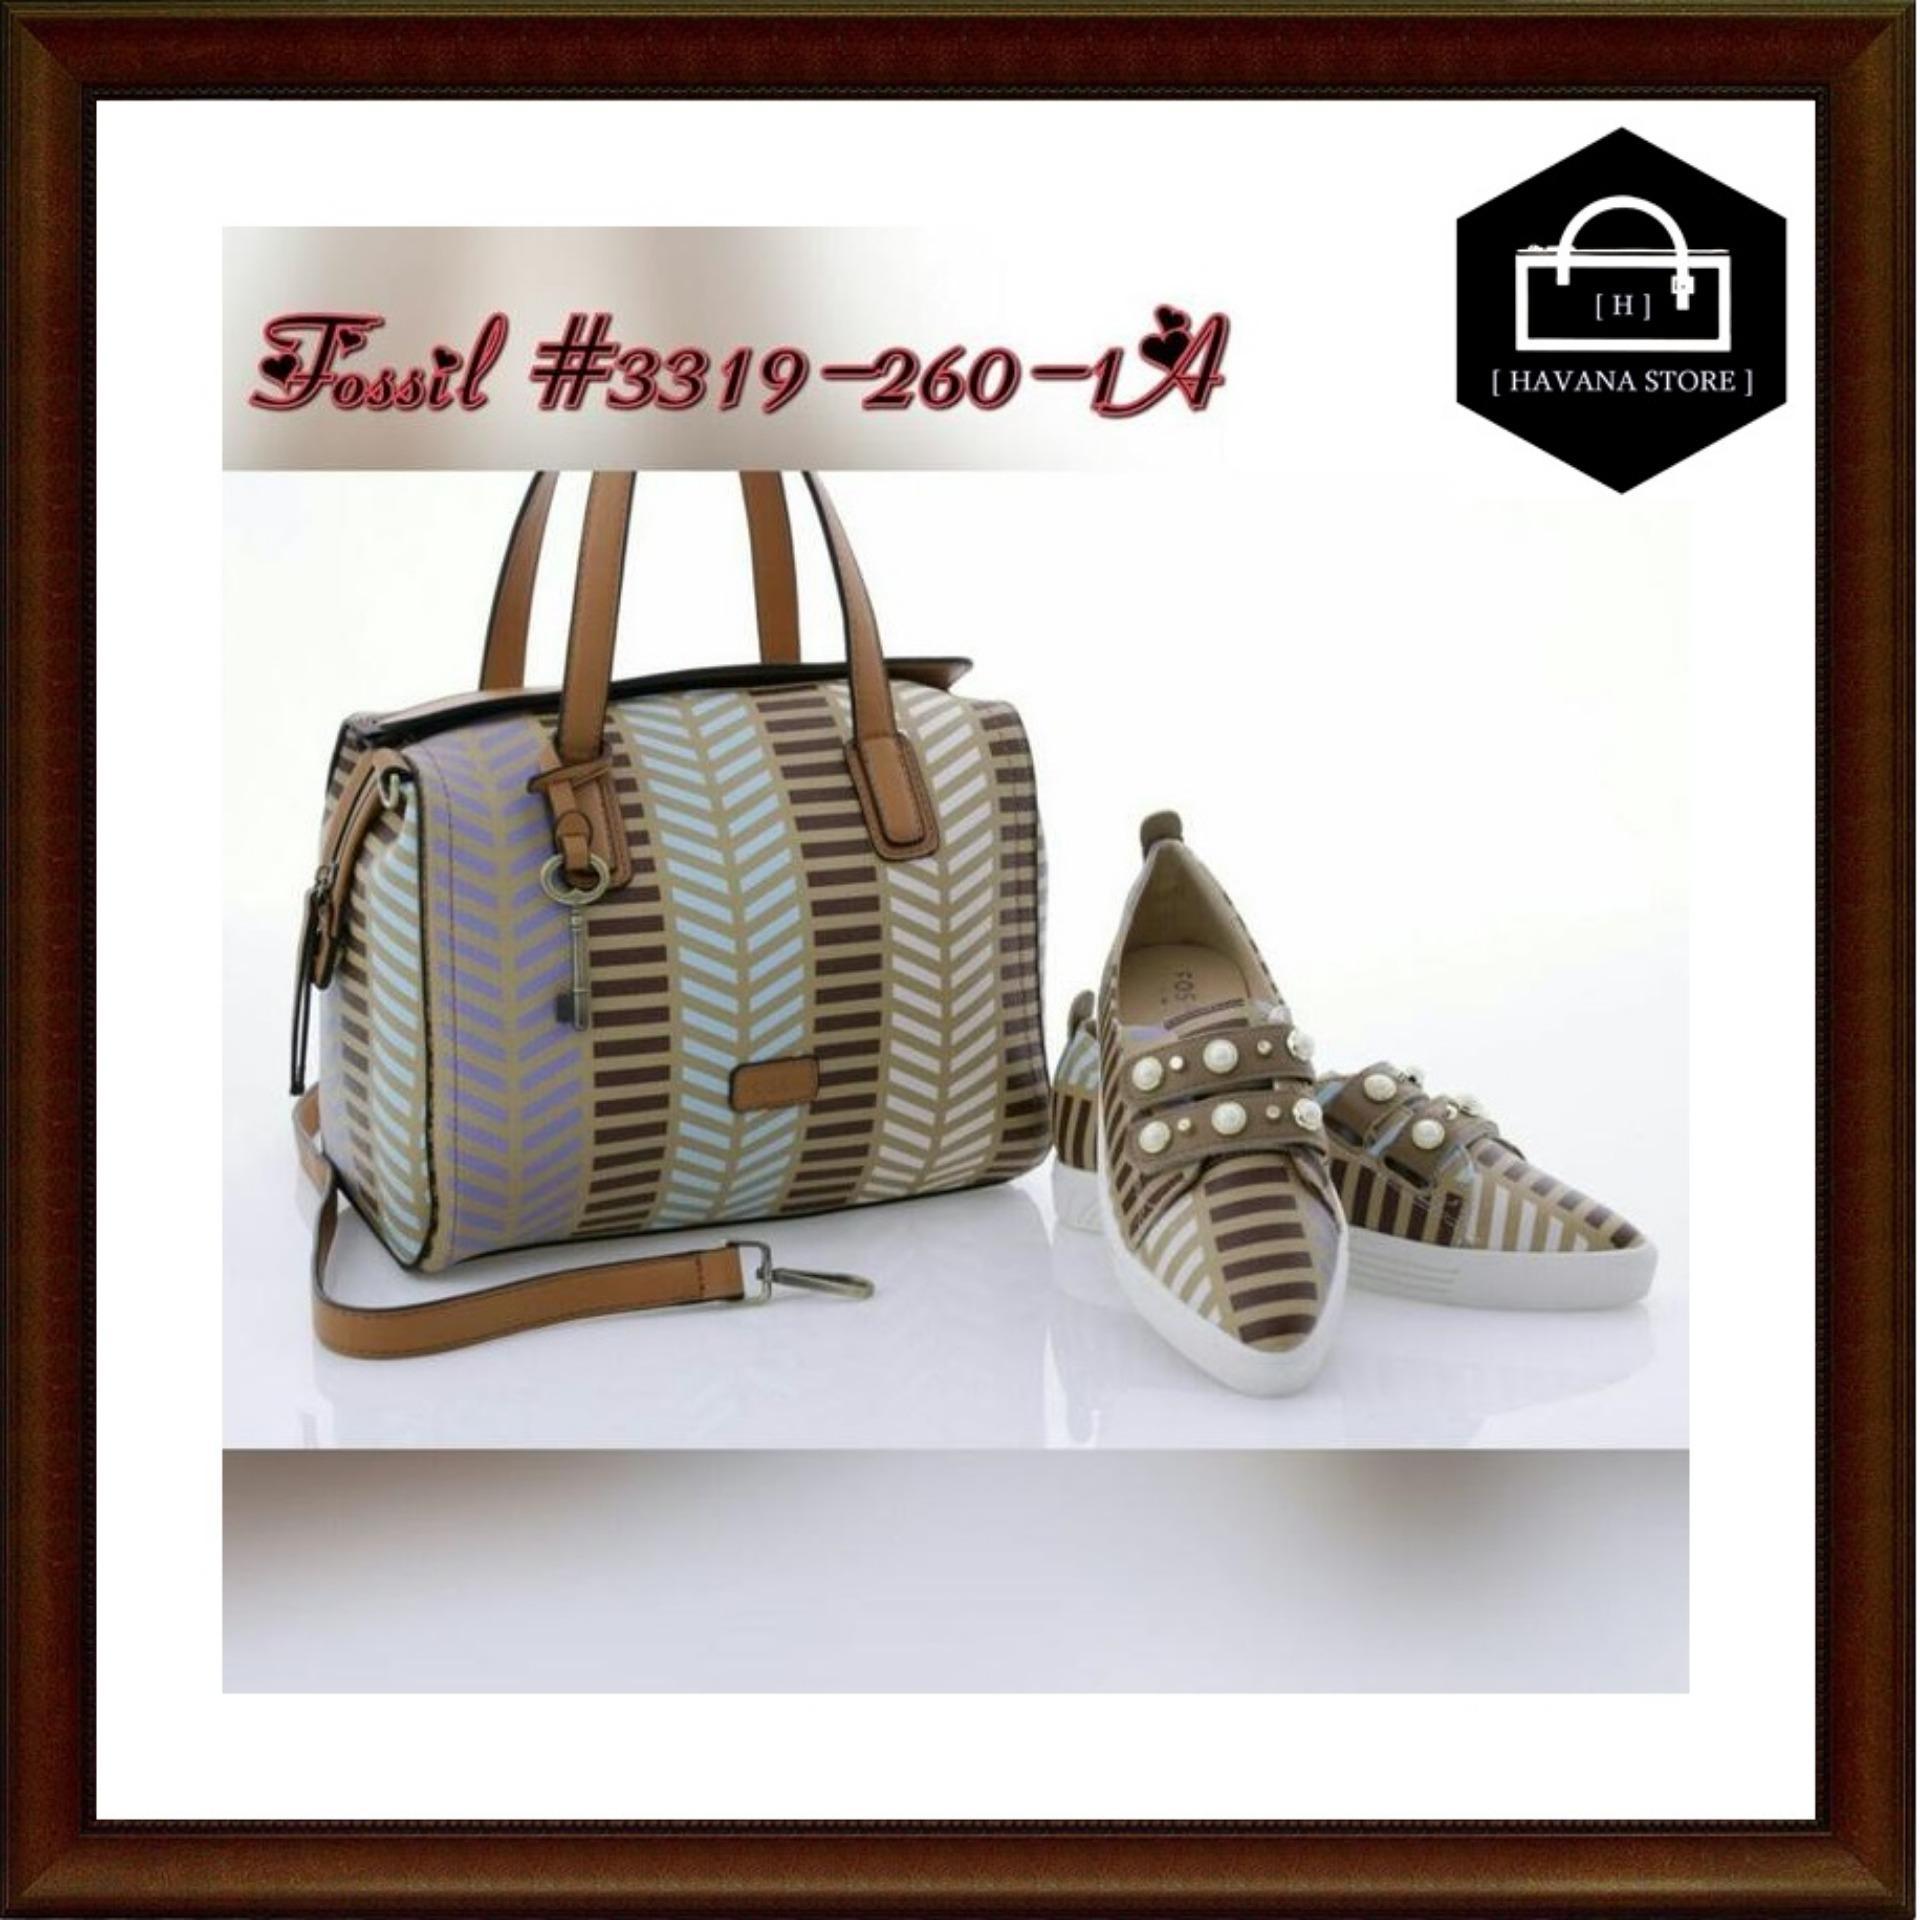 Tas Fossil Speedy Saylor Taiga 3in1 Semprem 3319-260-1A   bag   branded 9755acb38e